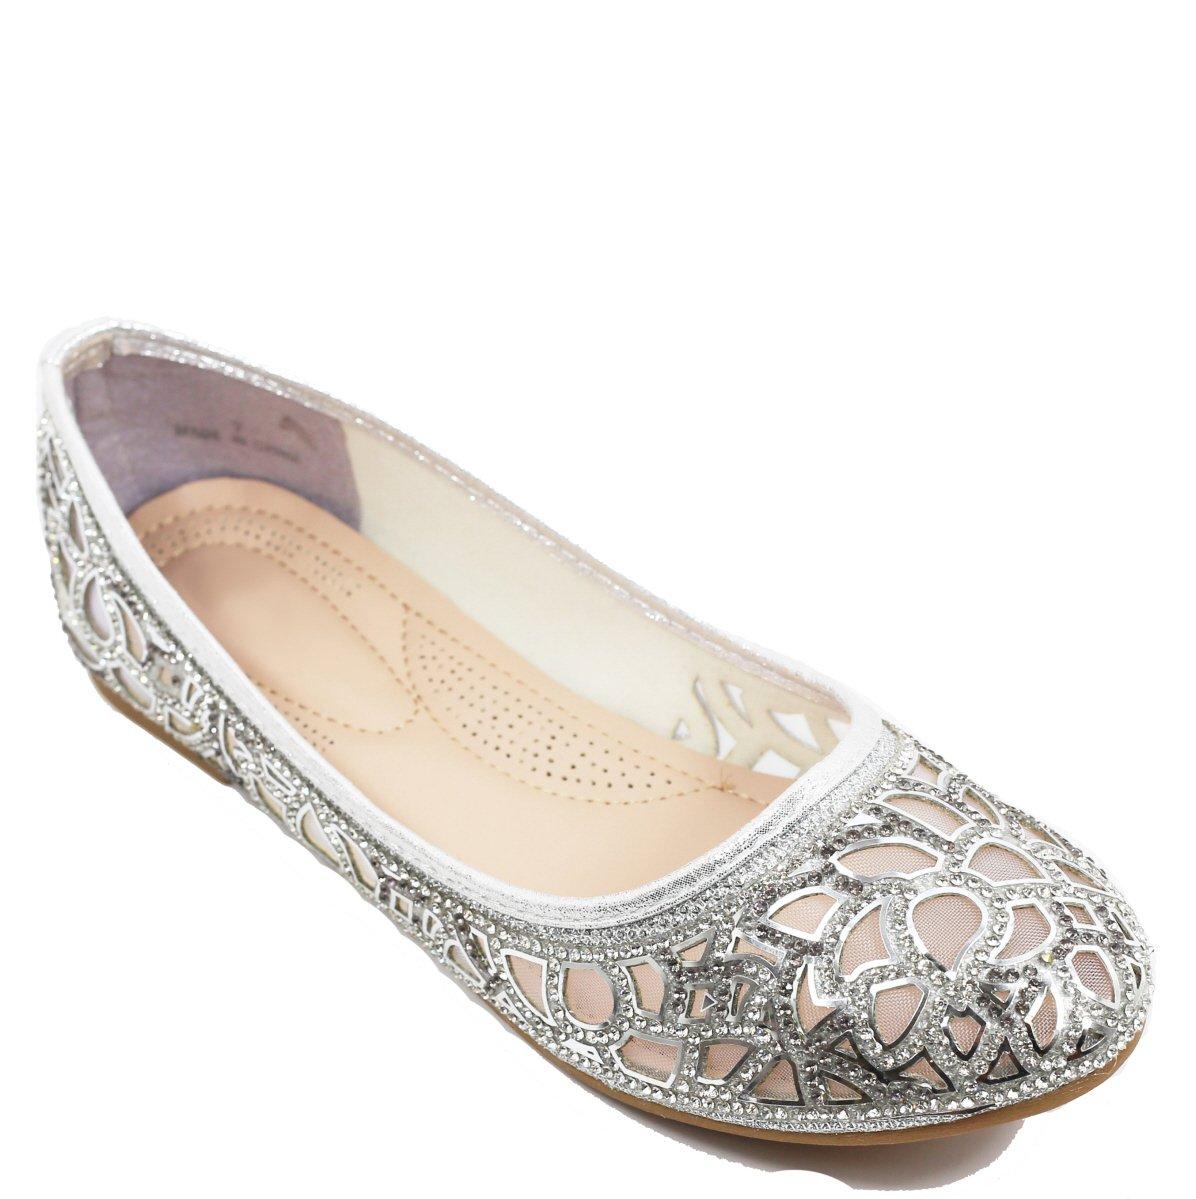 Walstar Women Rhinestone Flats Glitter Mesh Flats Slip on Shoes B071RS5D87 6.5 B(M) US|Mesh-silver